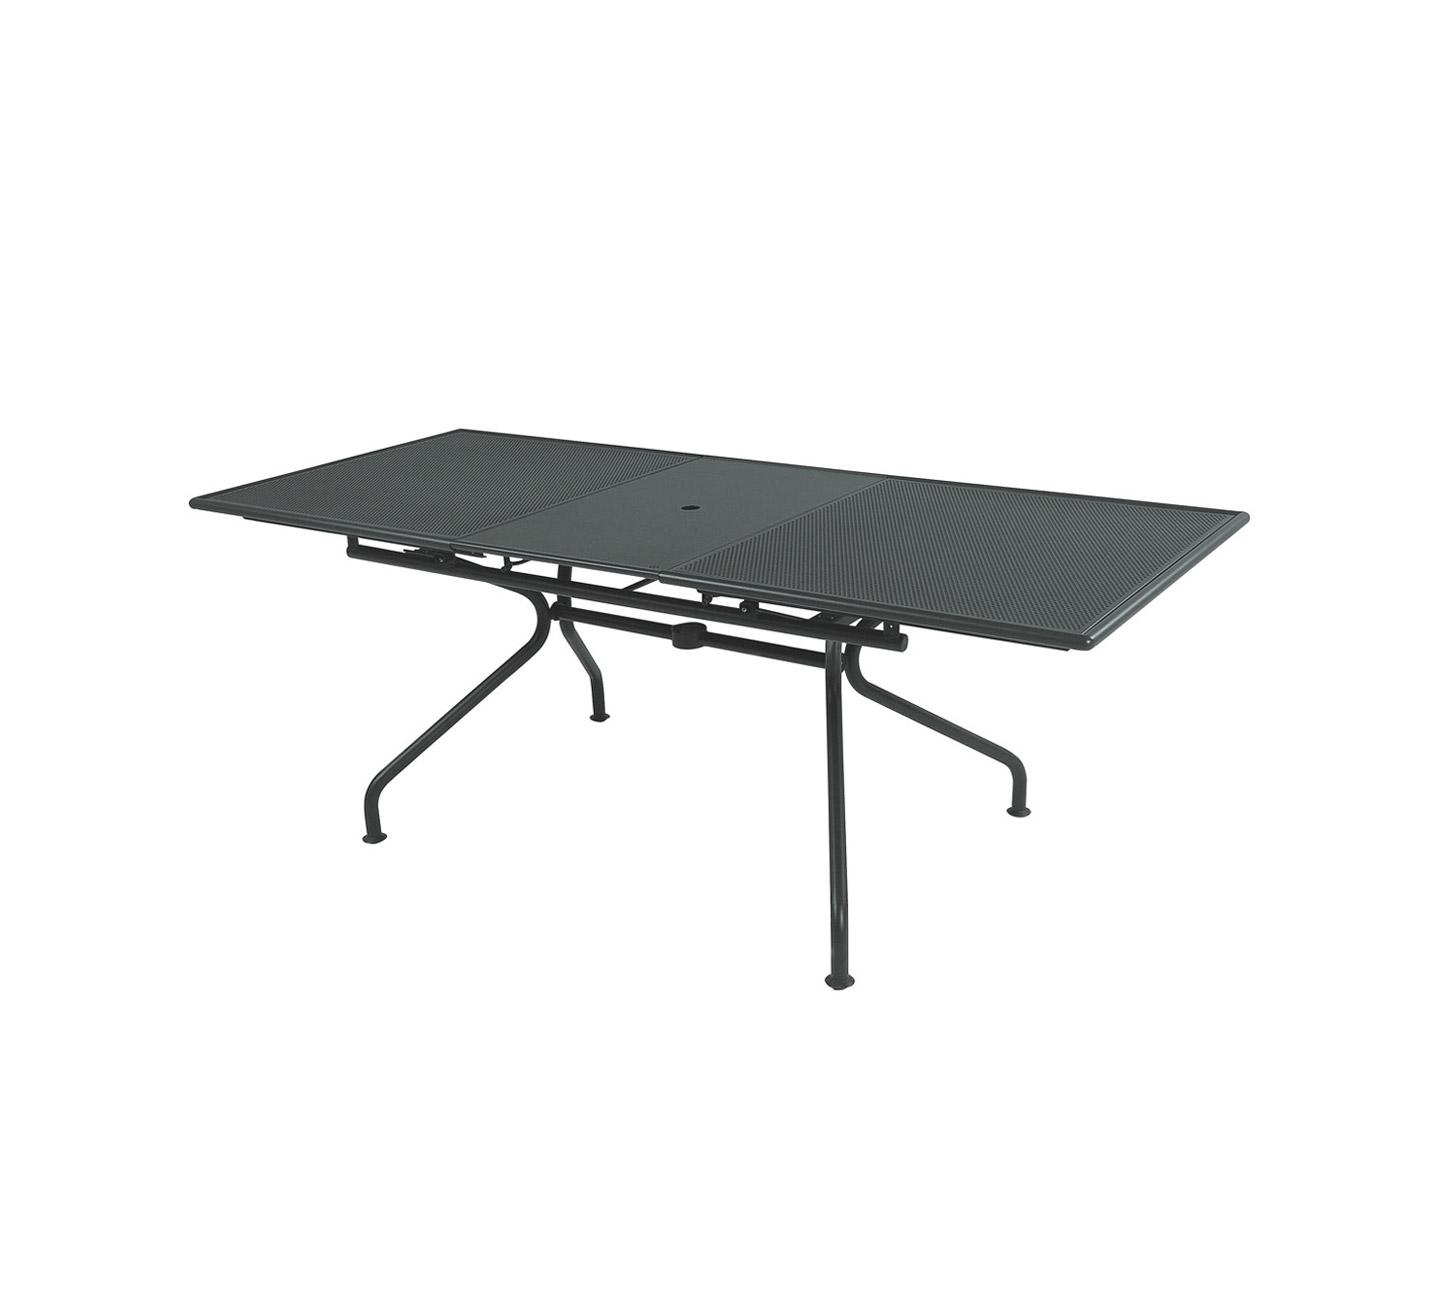 Emu Piano Tavolo Allungabile.Emu Piano Extending Table 160 Grey Mohd Shop